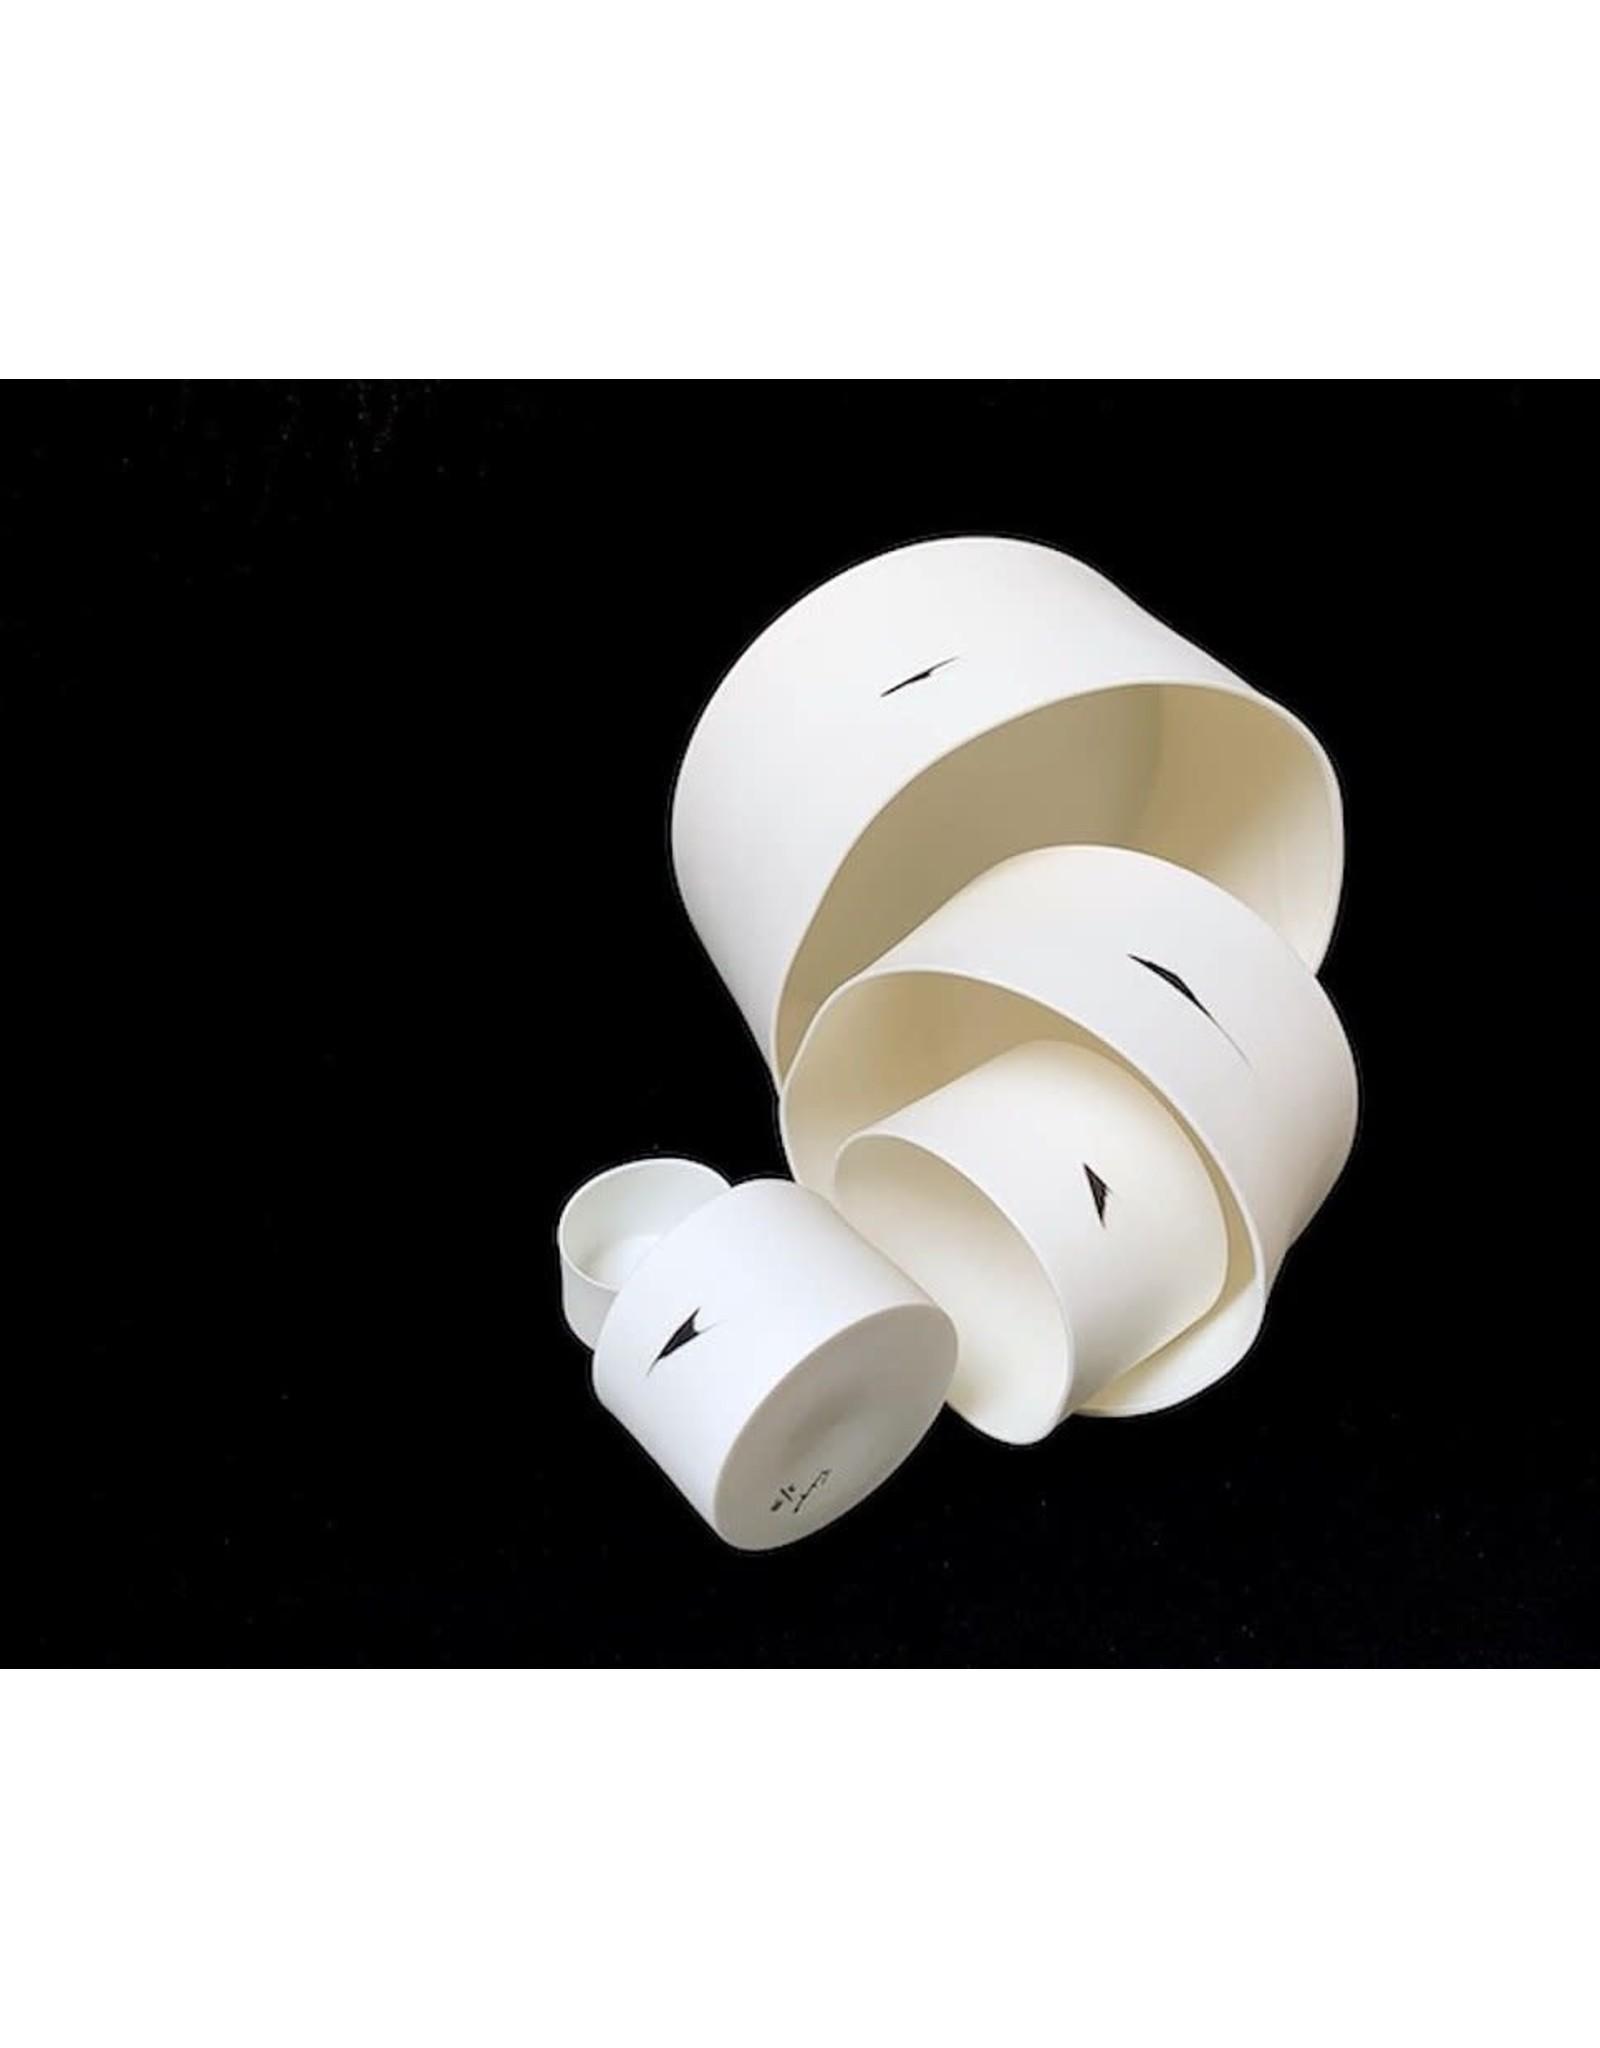 Porcelain Art Studio Clyde Windlicht Cilinder Small